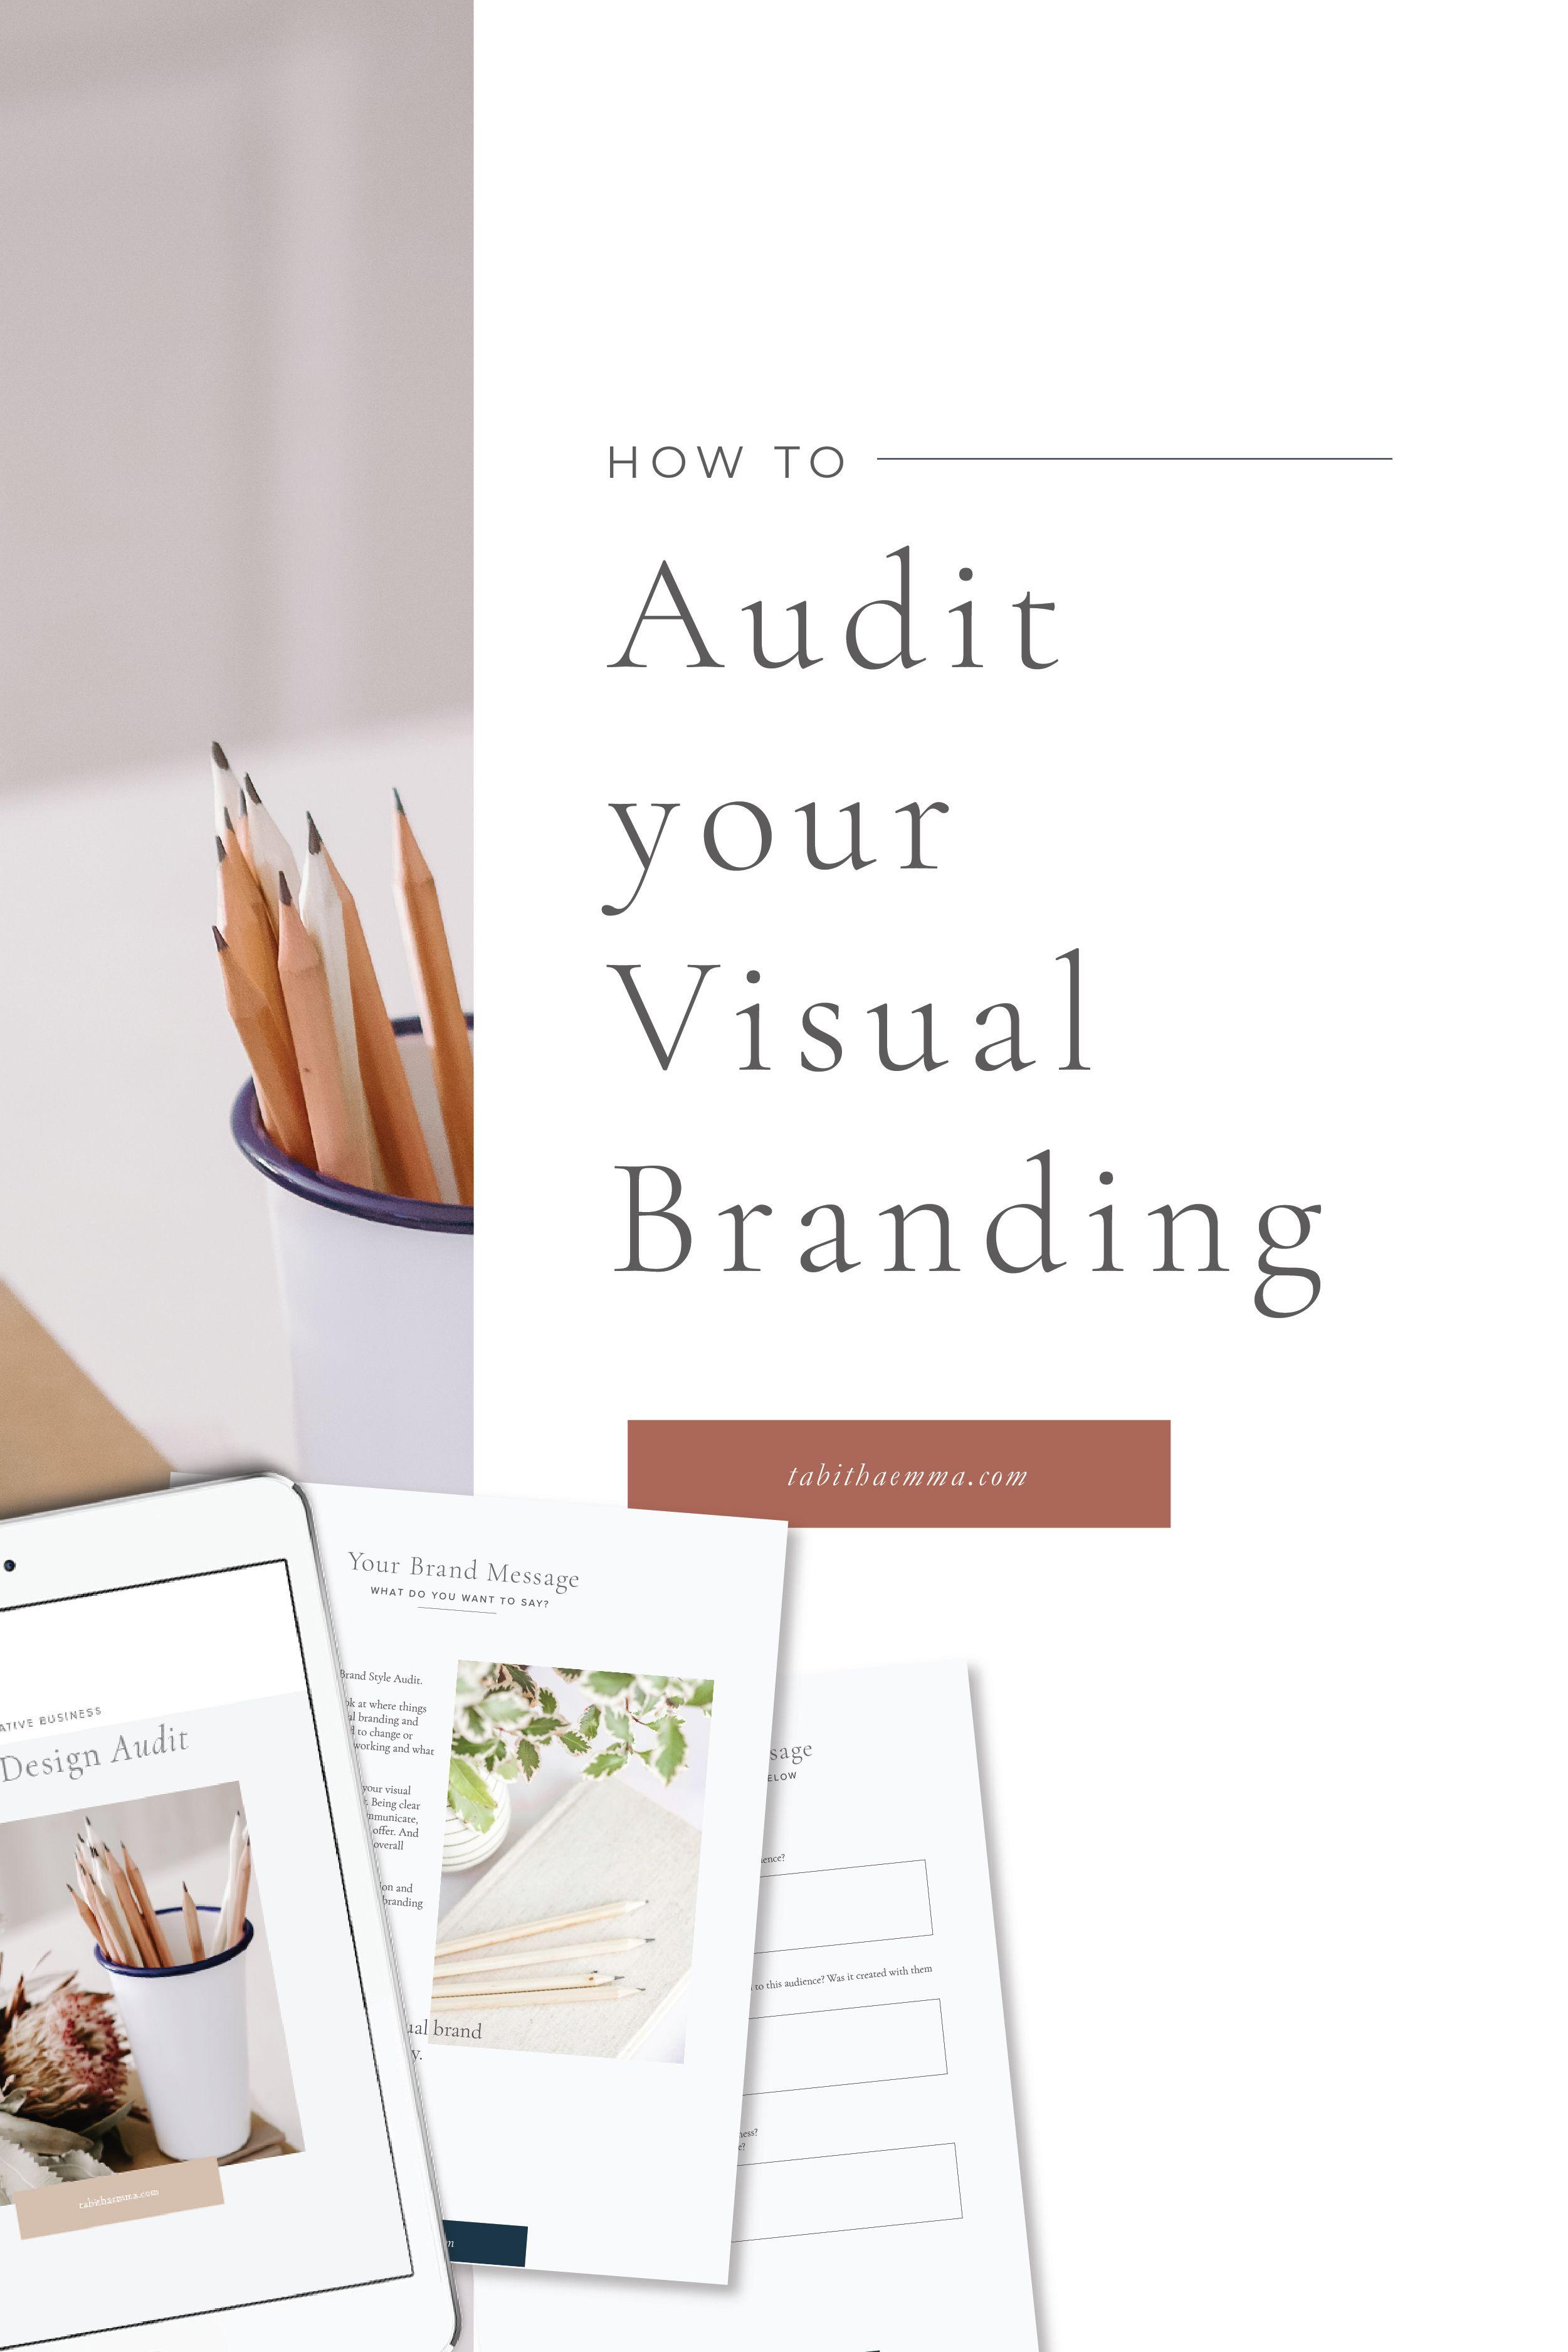 Brand Design Audit Workbook In 2020 Visual Branding Branding Design Branding